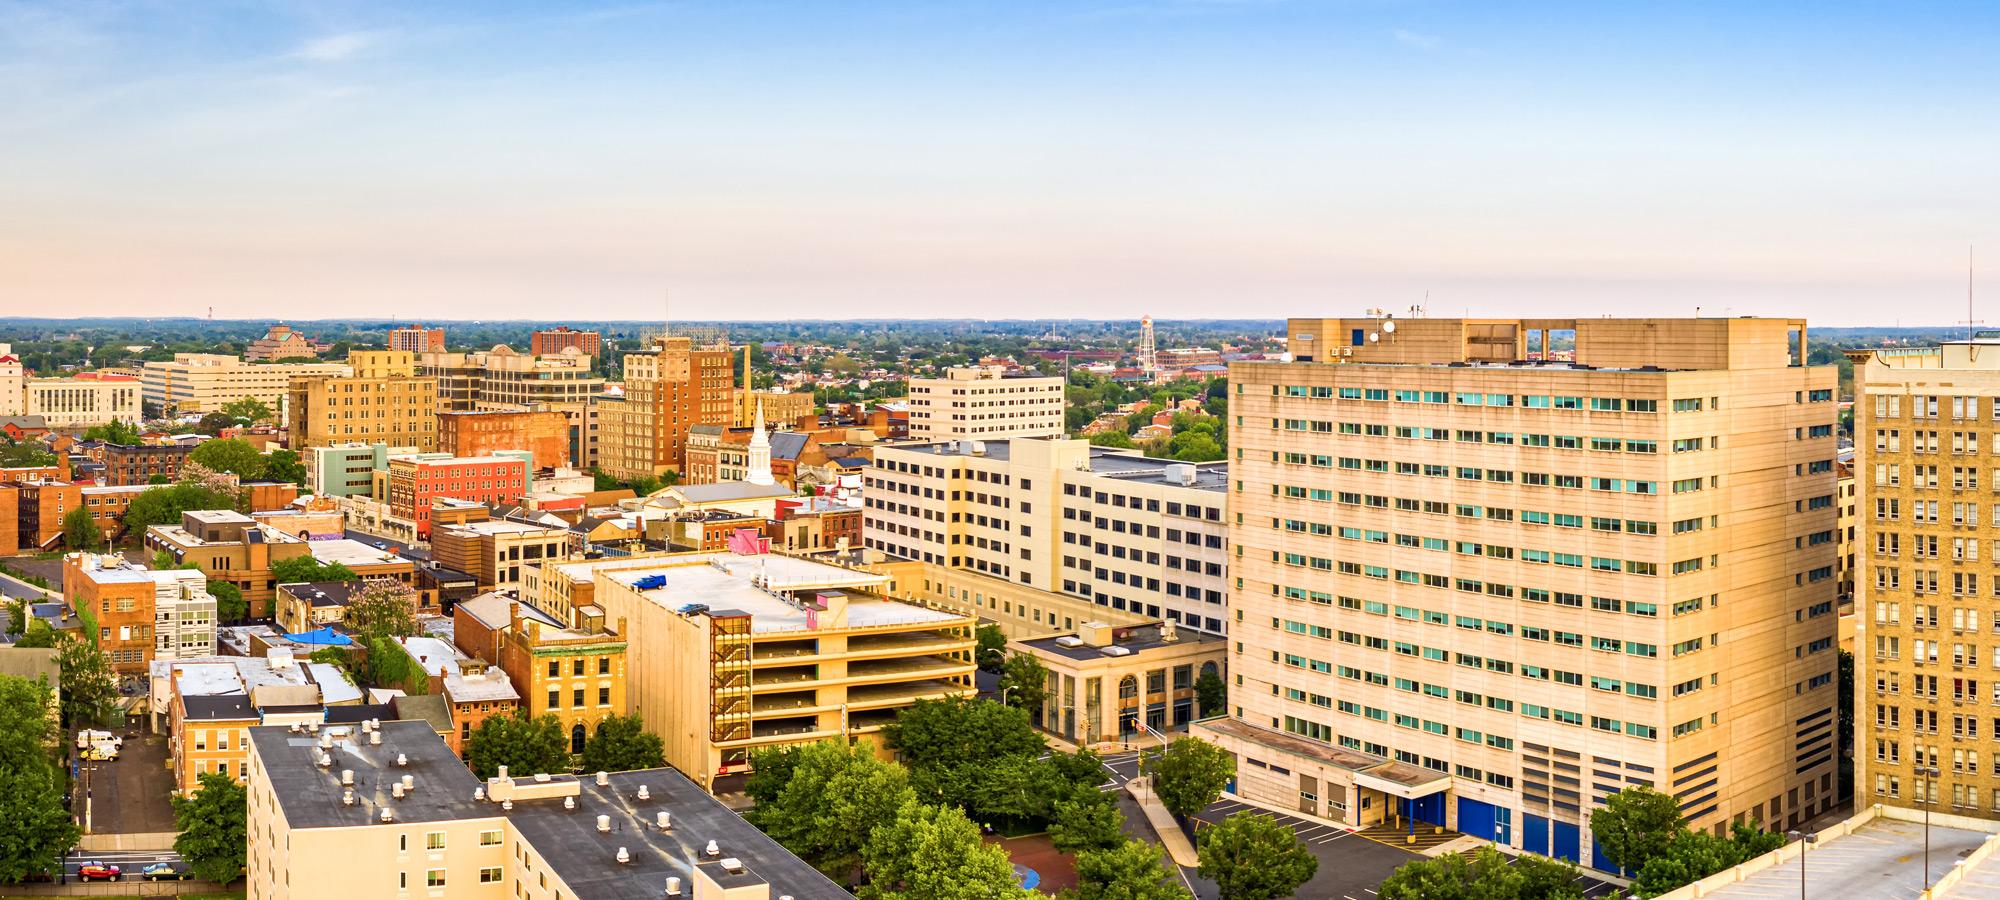 Trenton NJ skyline